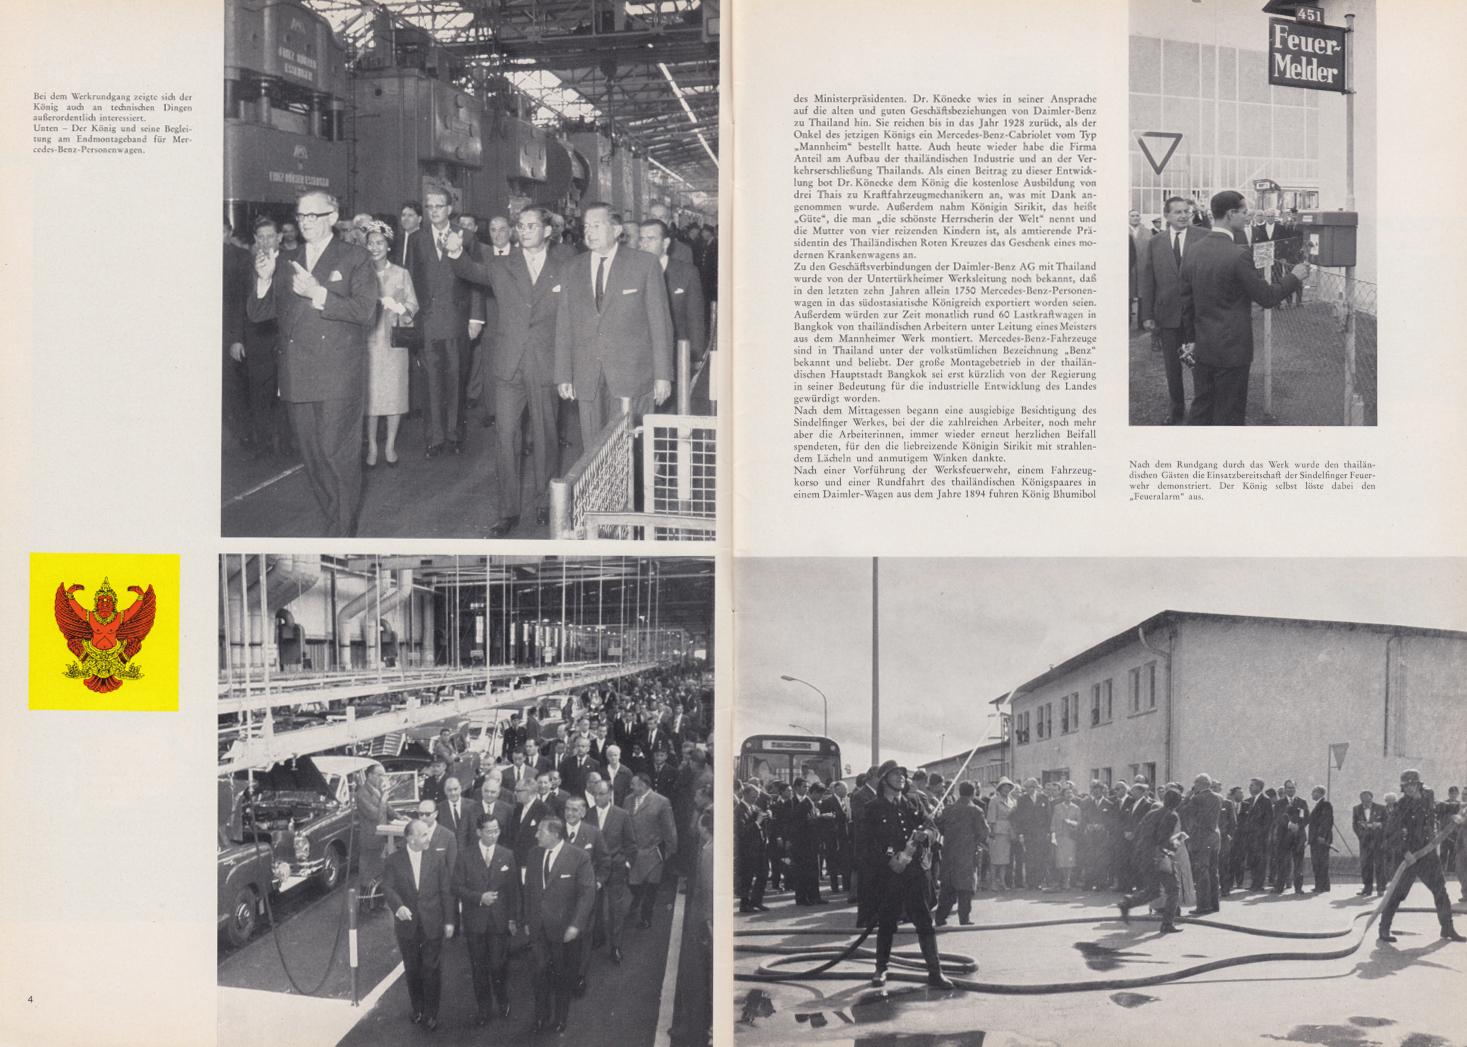 (REVISTA): Periódico In aller welt n.º 44 - Mercedes-Benz no mundo - 1960 - multilingue 003